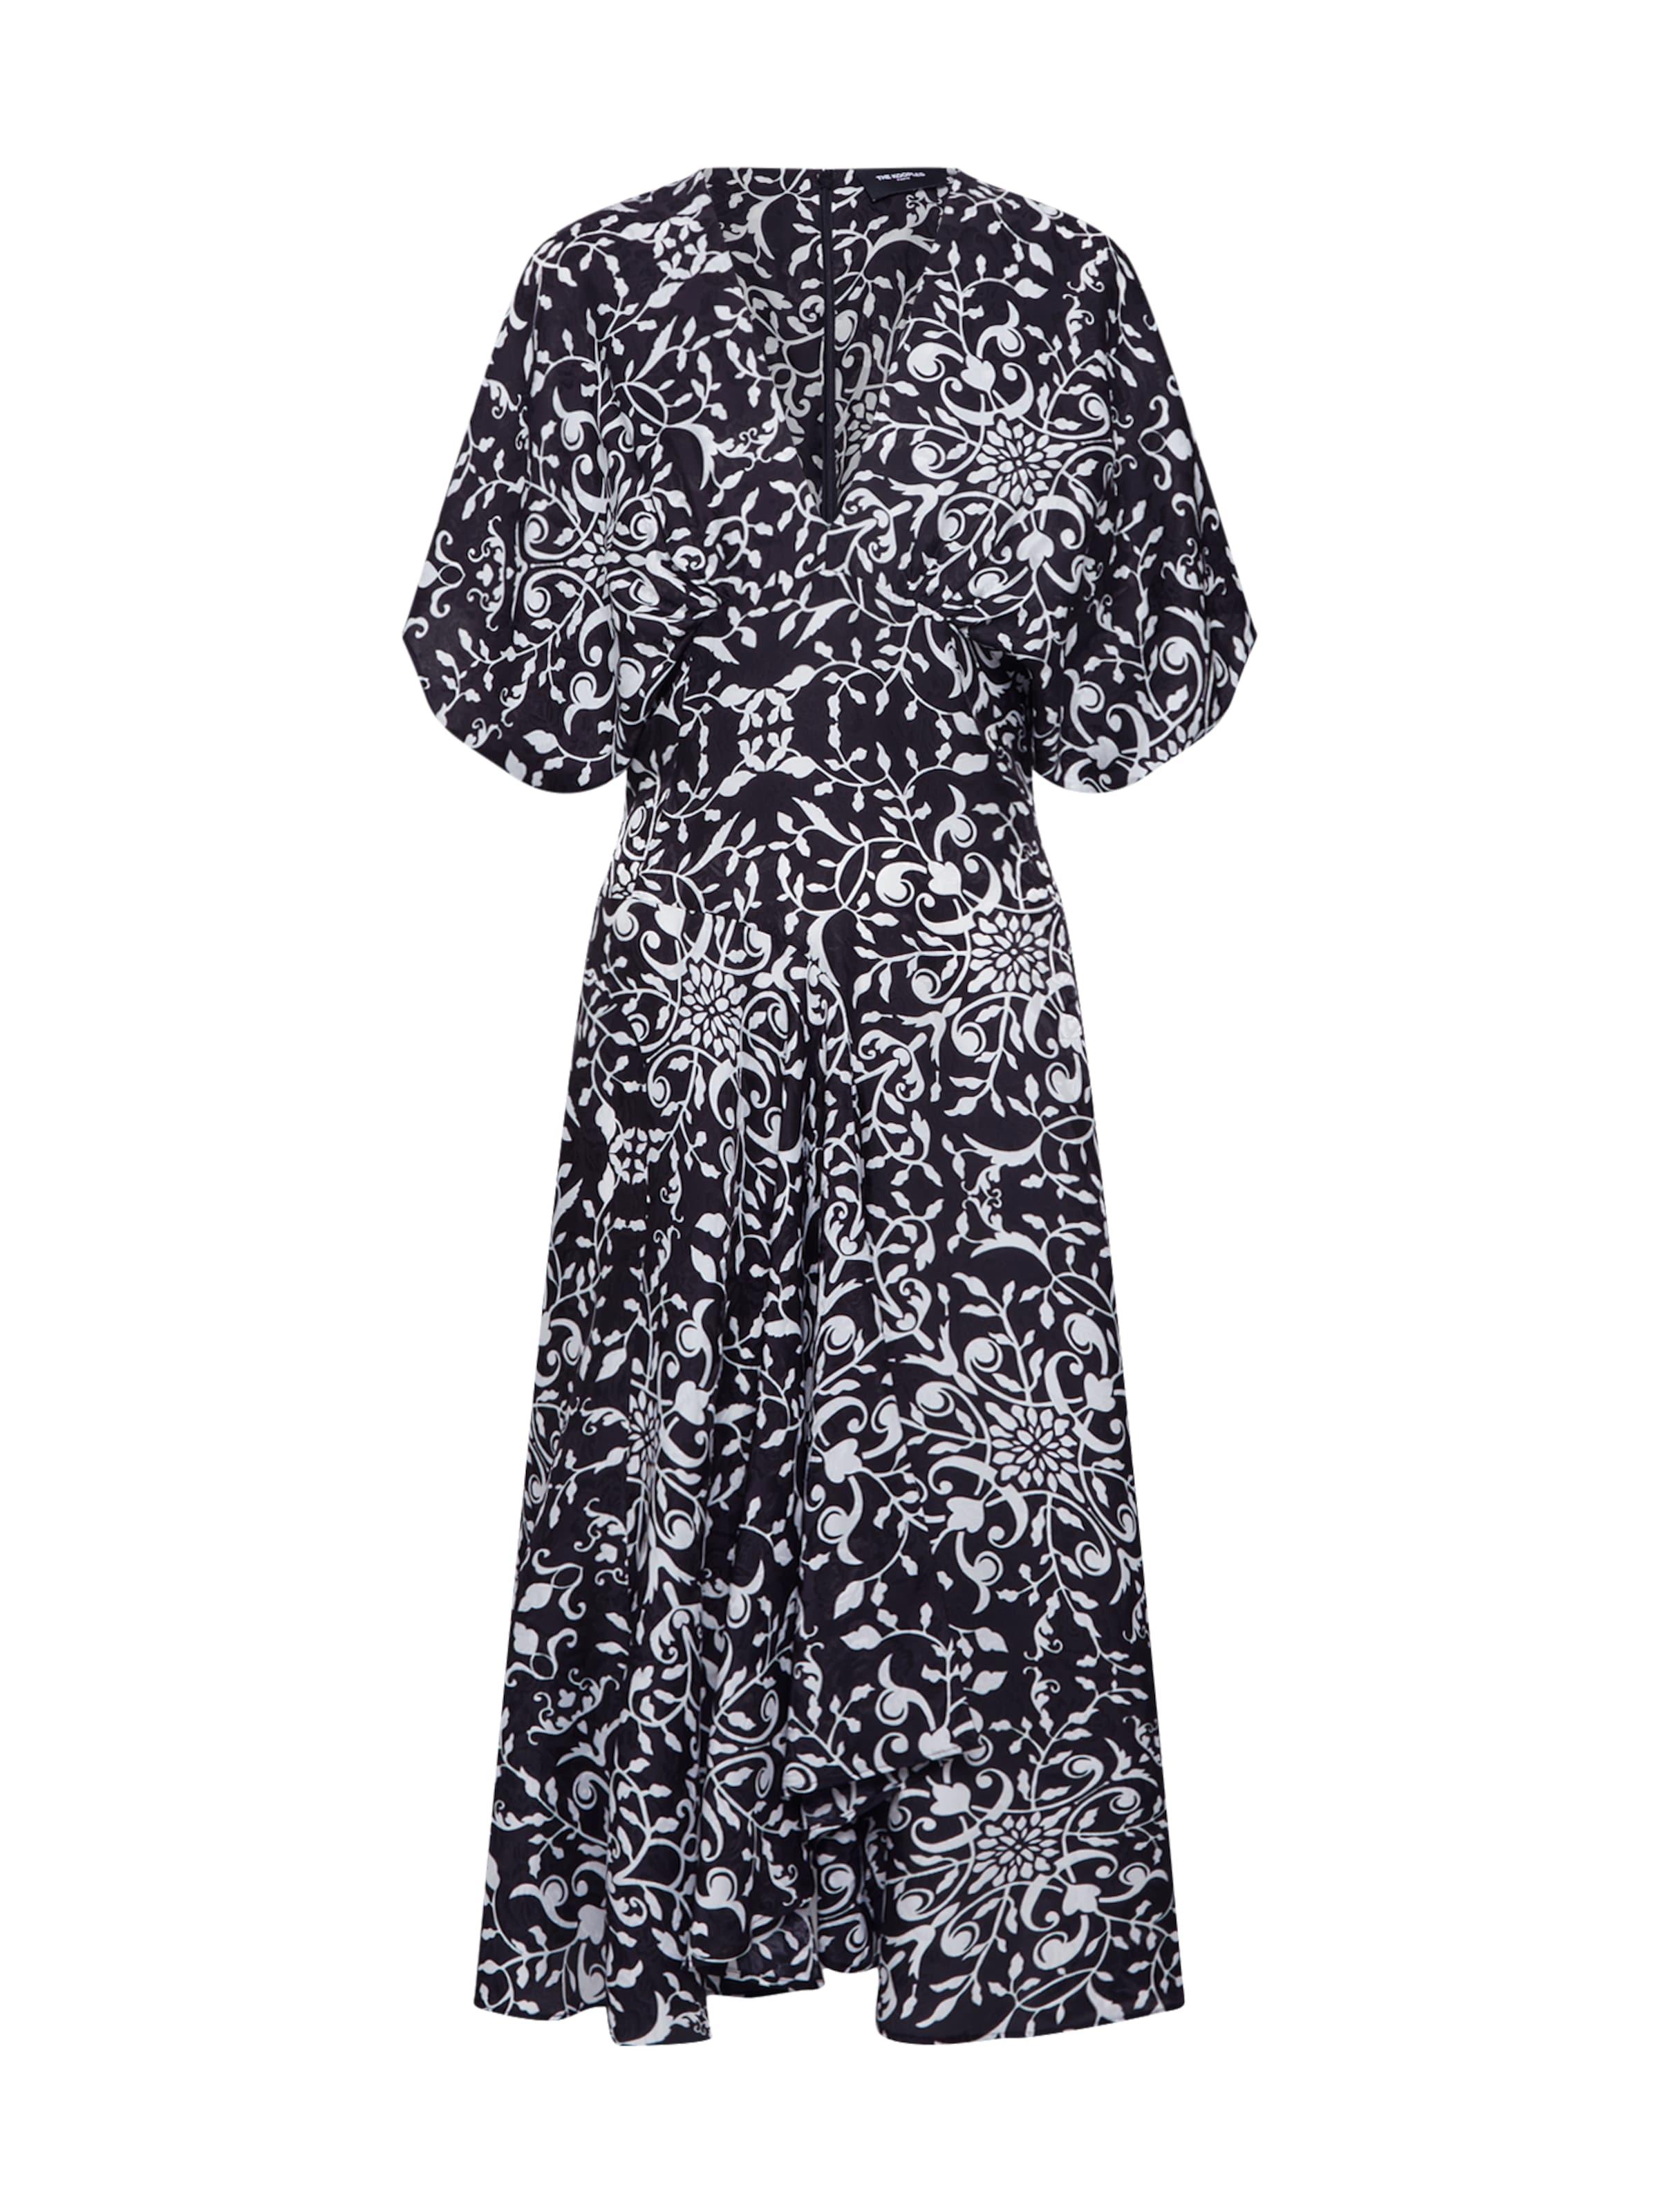 'frob19002k' Kooples Kleid In SchwarzWeiß The lFTJcuK13